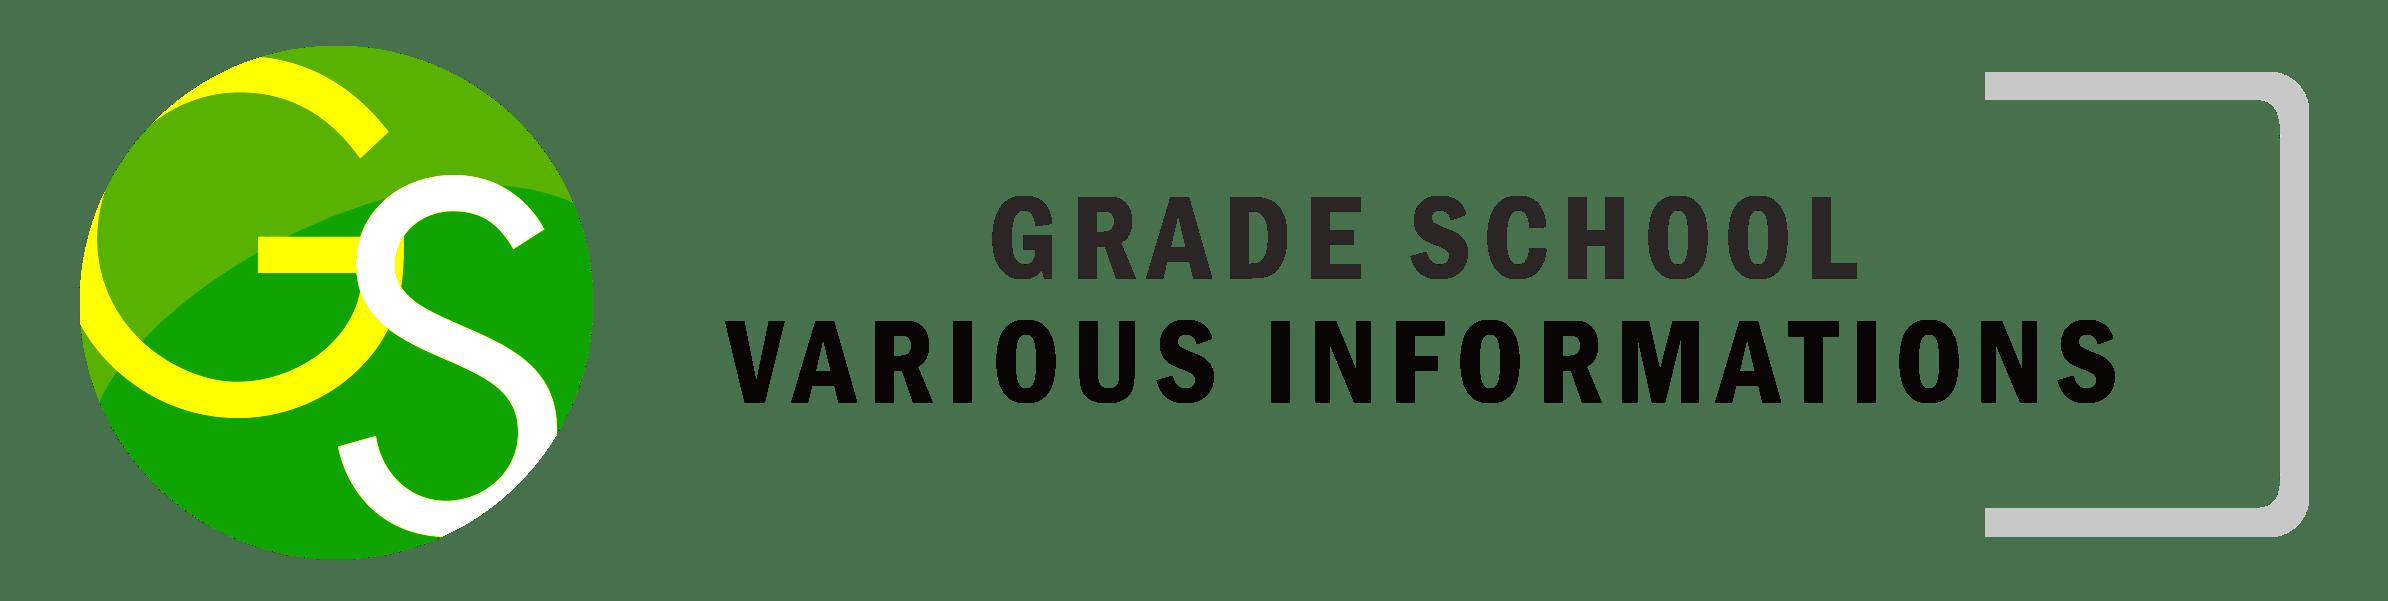 ICO_GS_VariousInfo